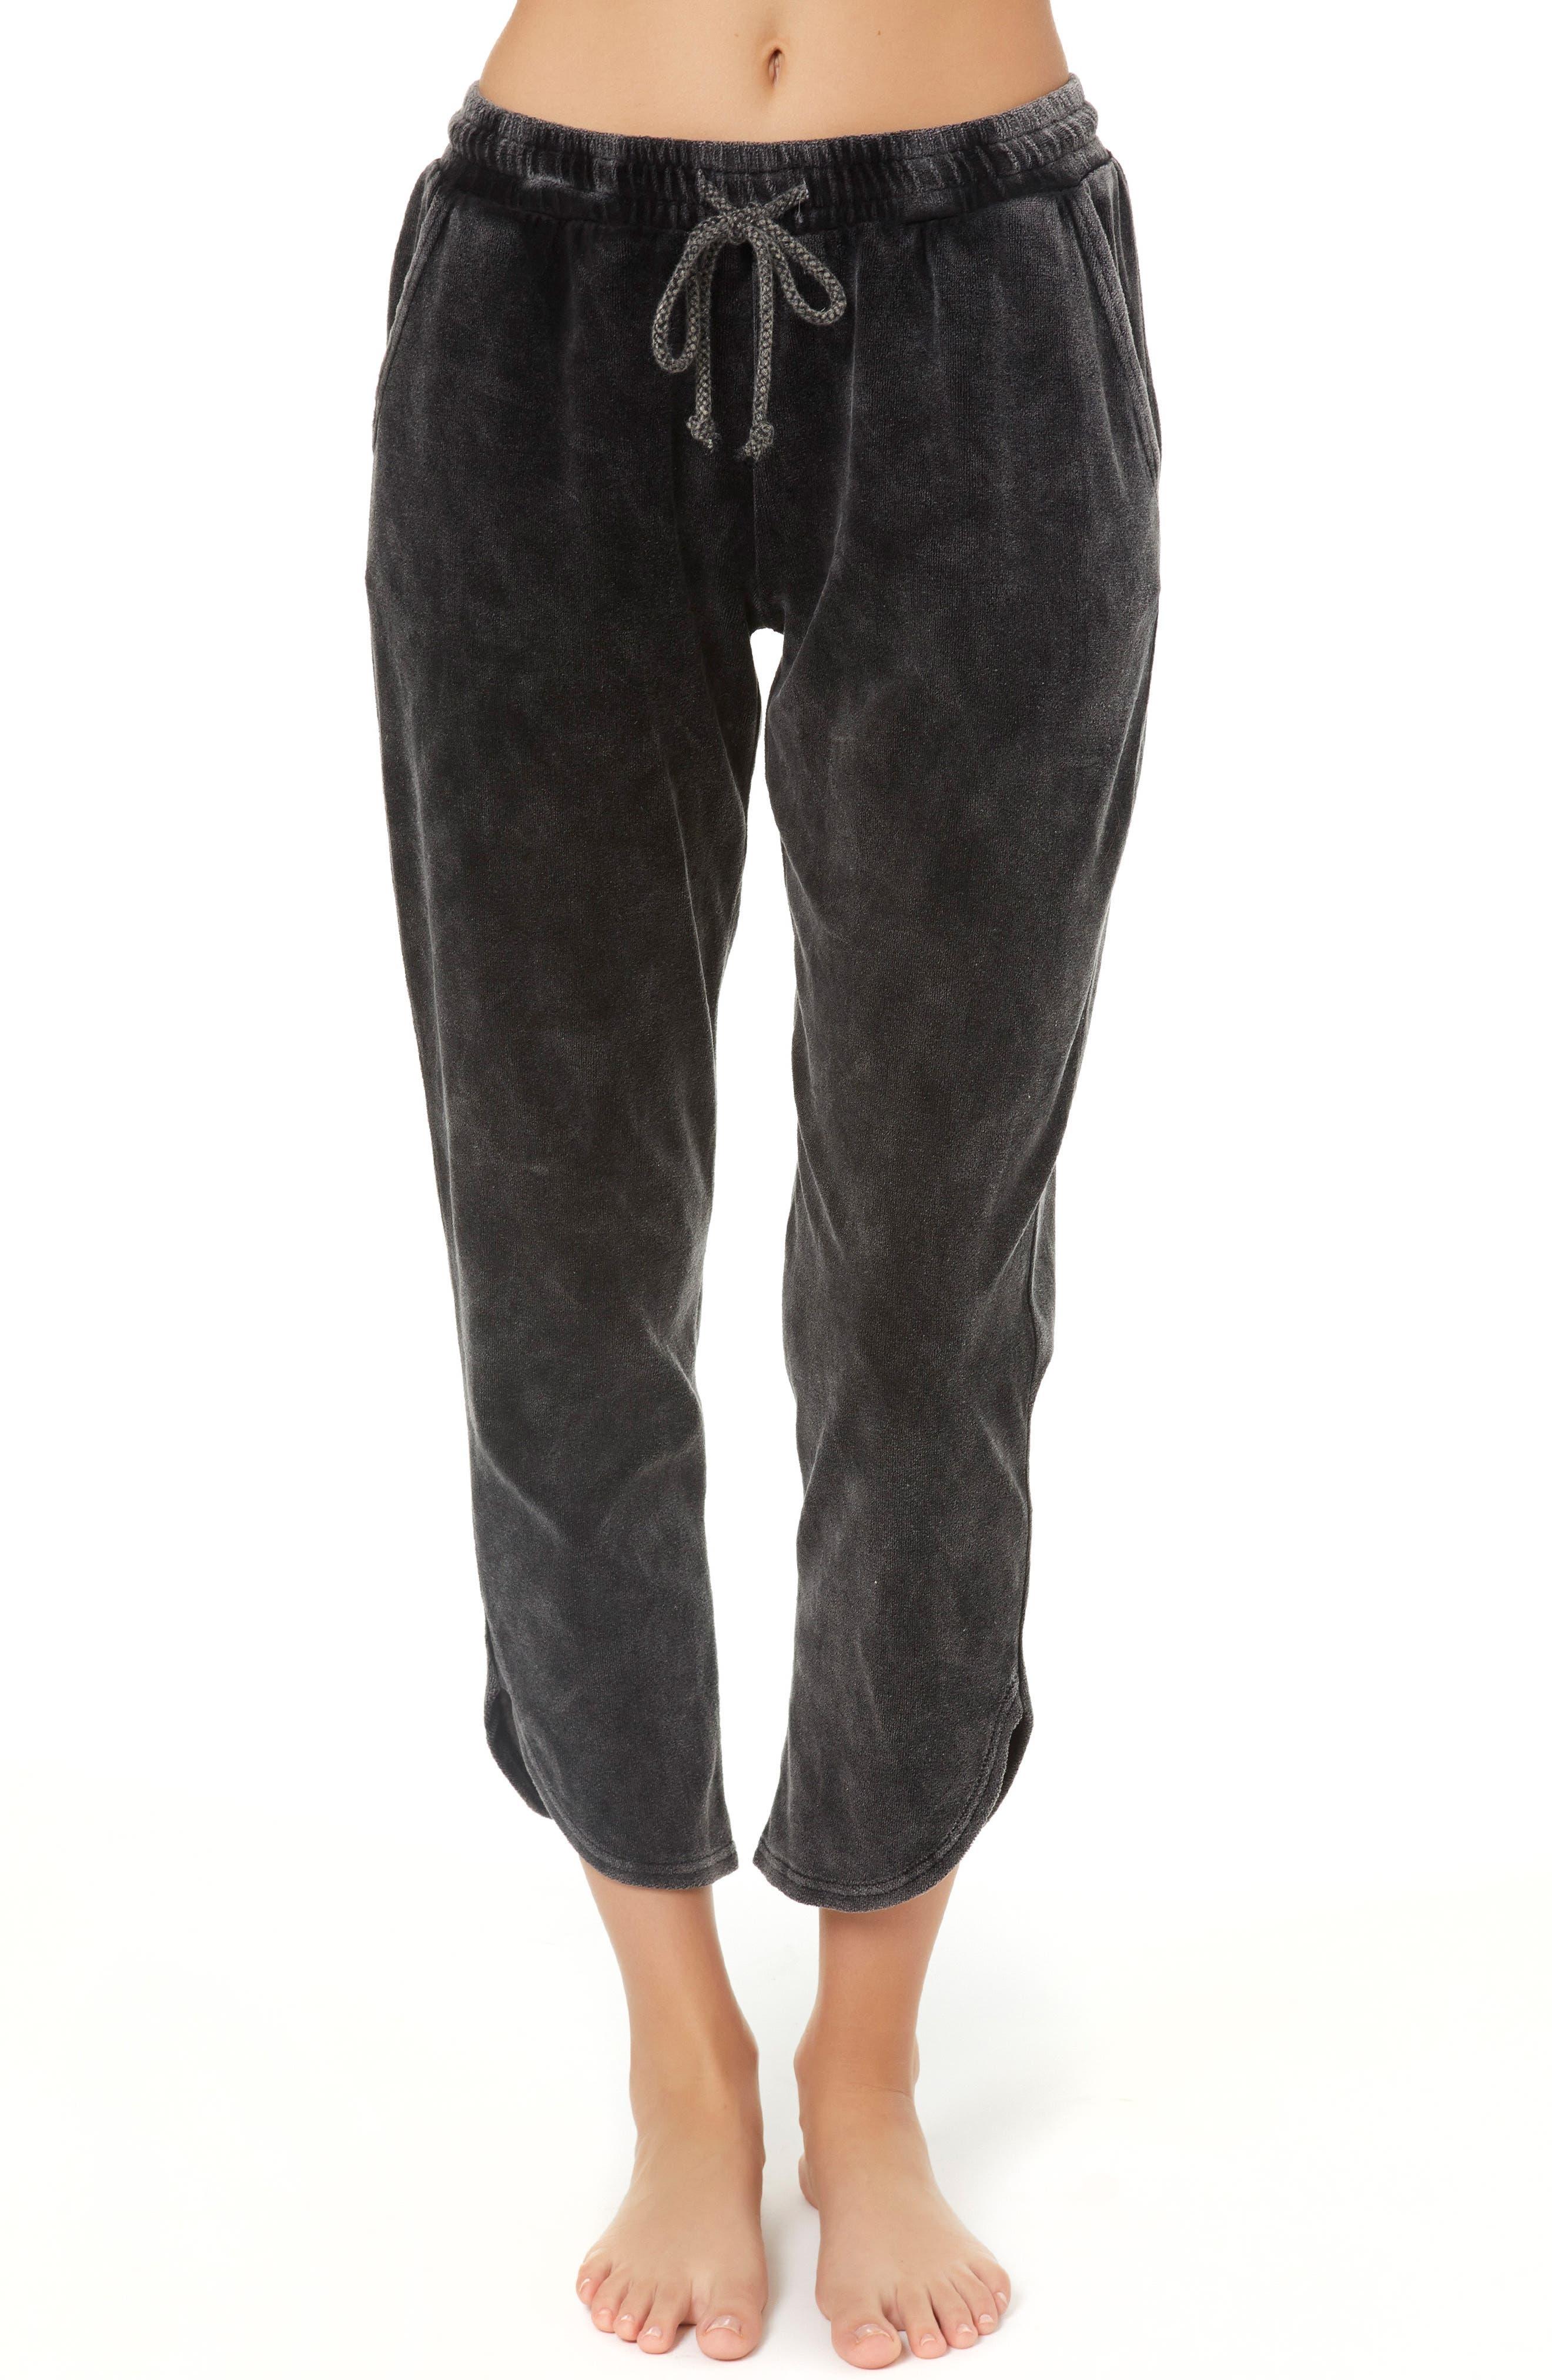 Ackerman Velour Track Pants,                         Main,                         color, CHARCOAL